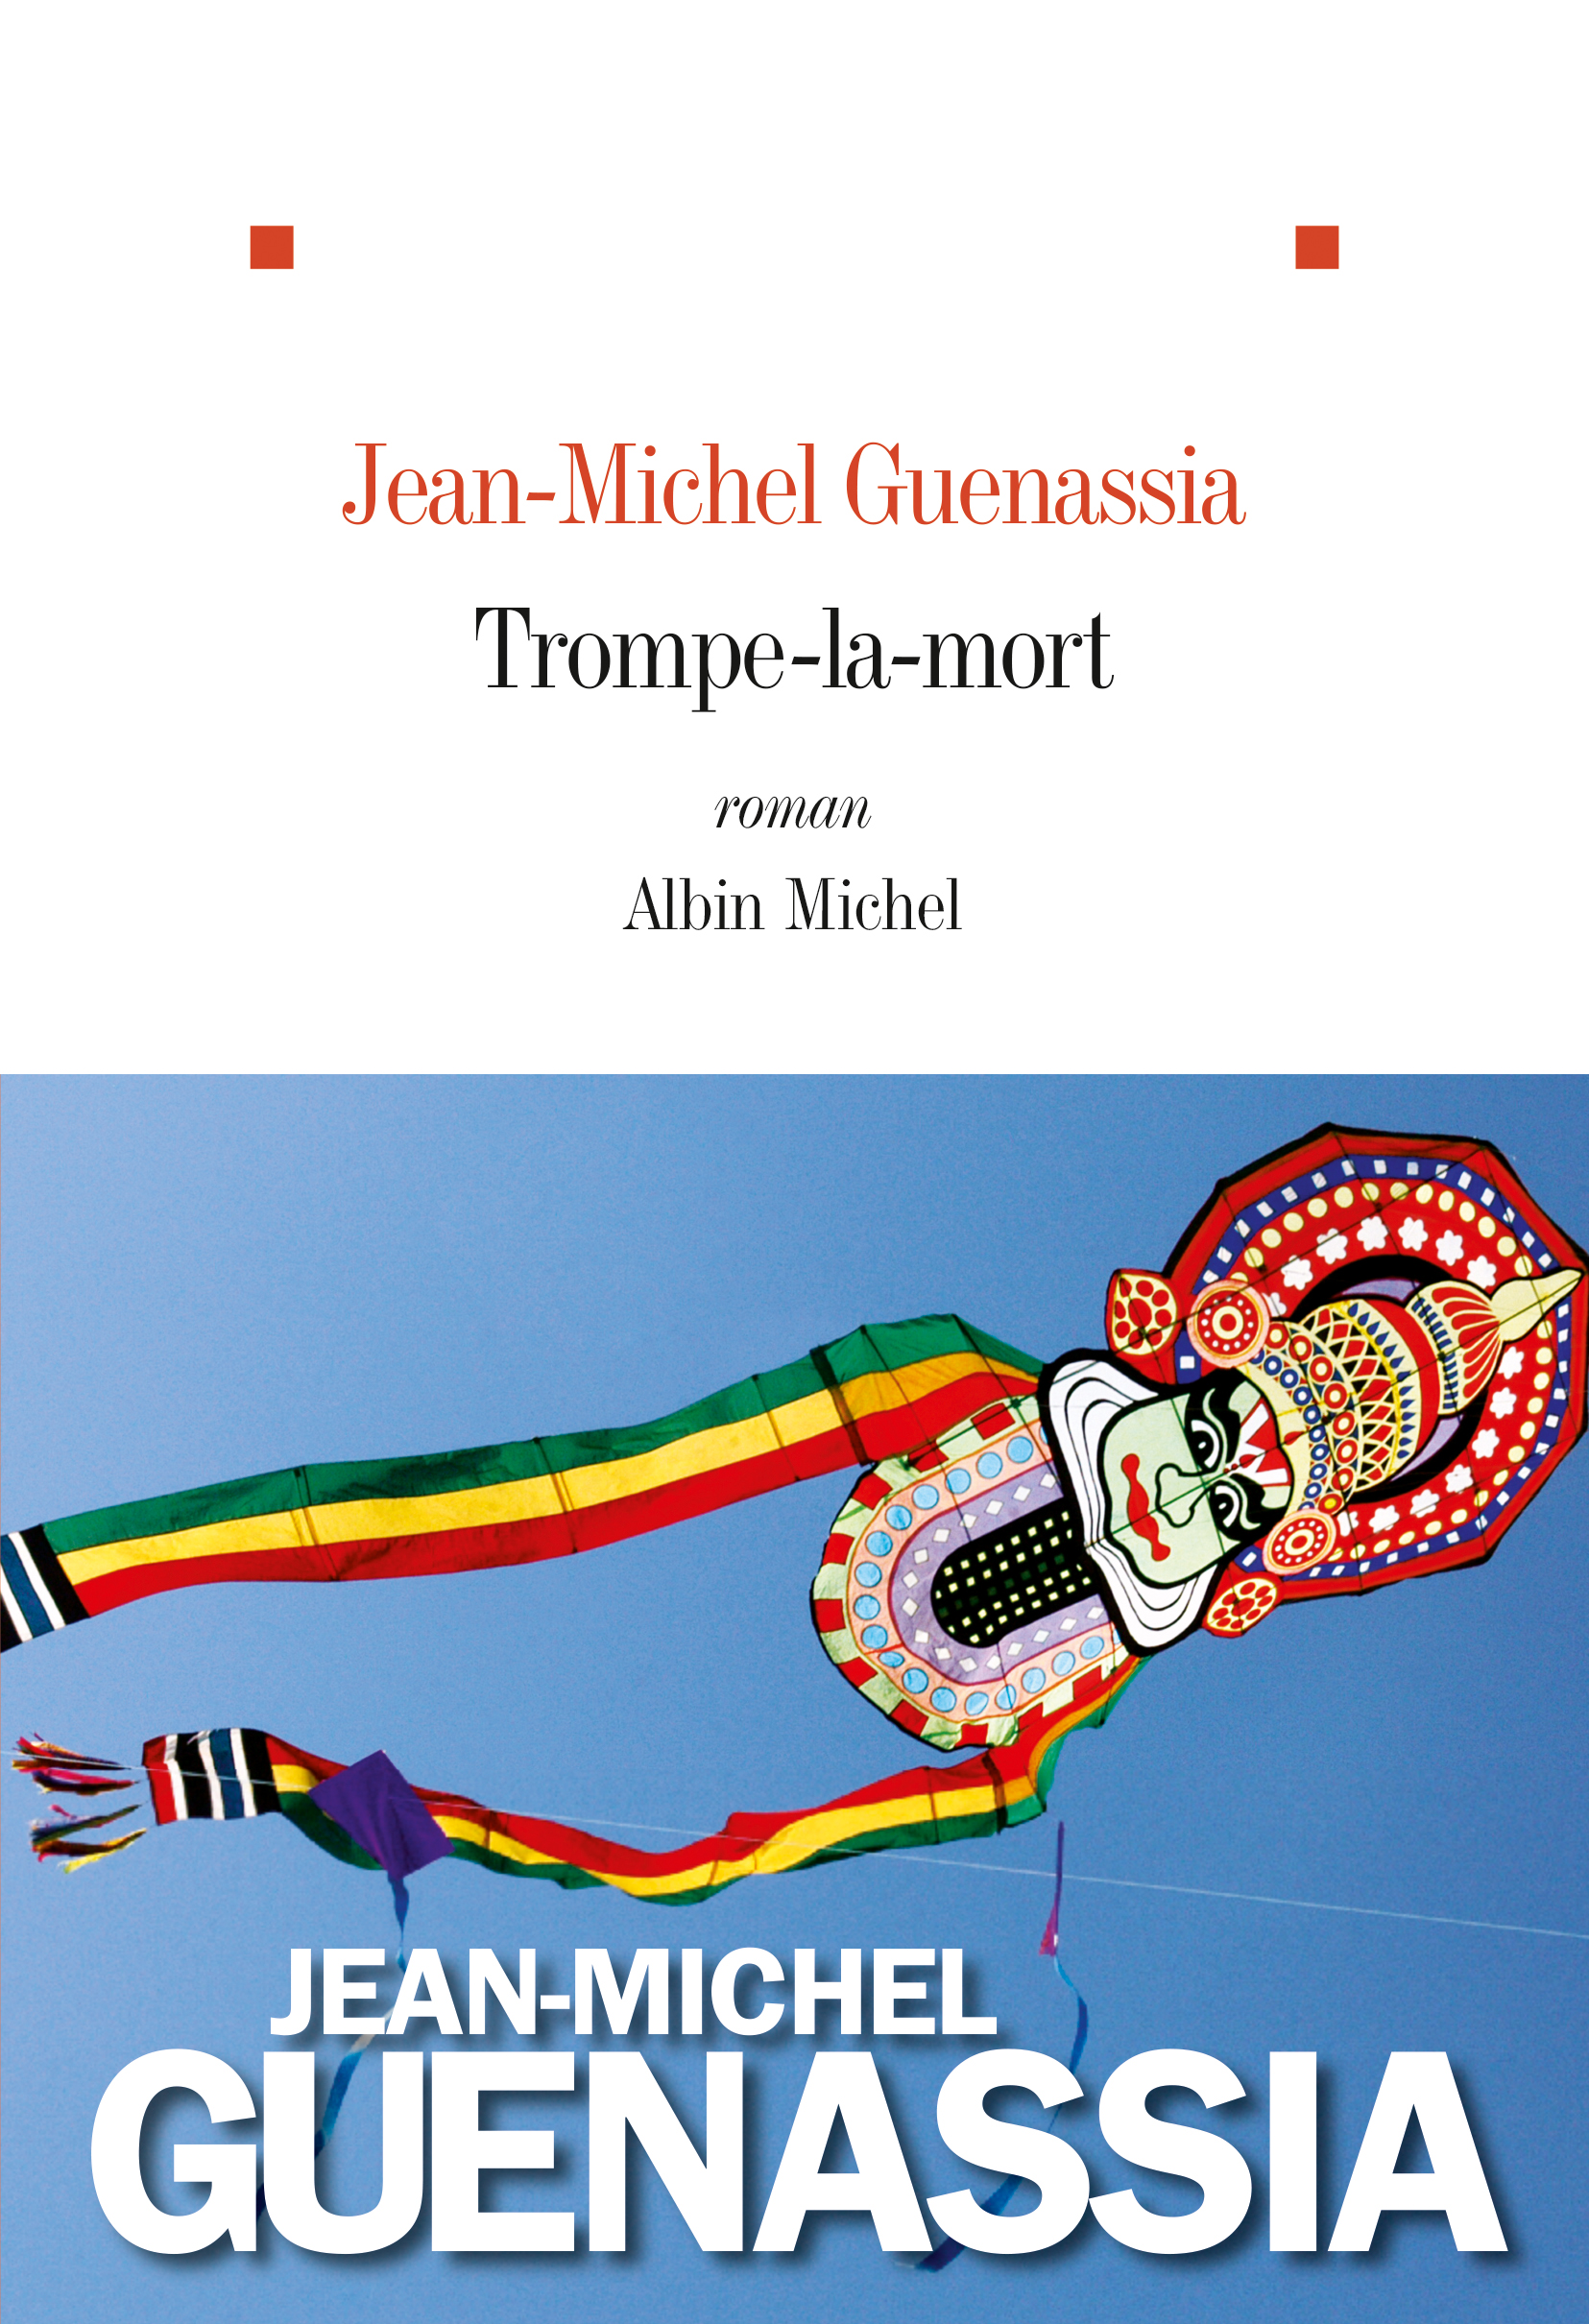 Trompe-la-mort - Jean-Michel GuenassiaAlbin Michel, 2015 - Prix : 22€ISBN :  978-2226312464